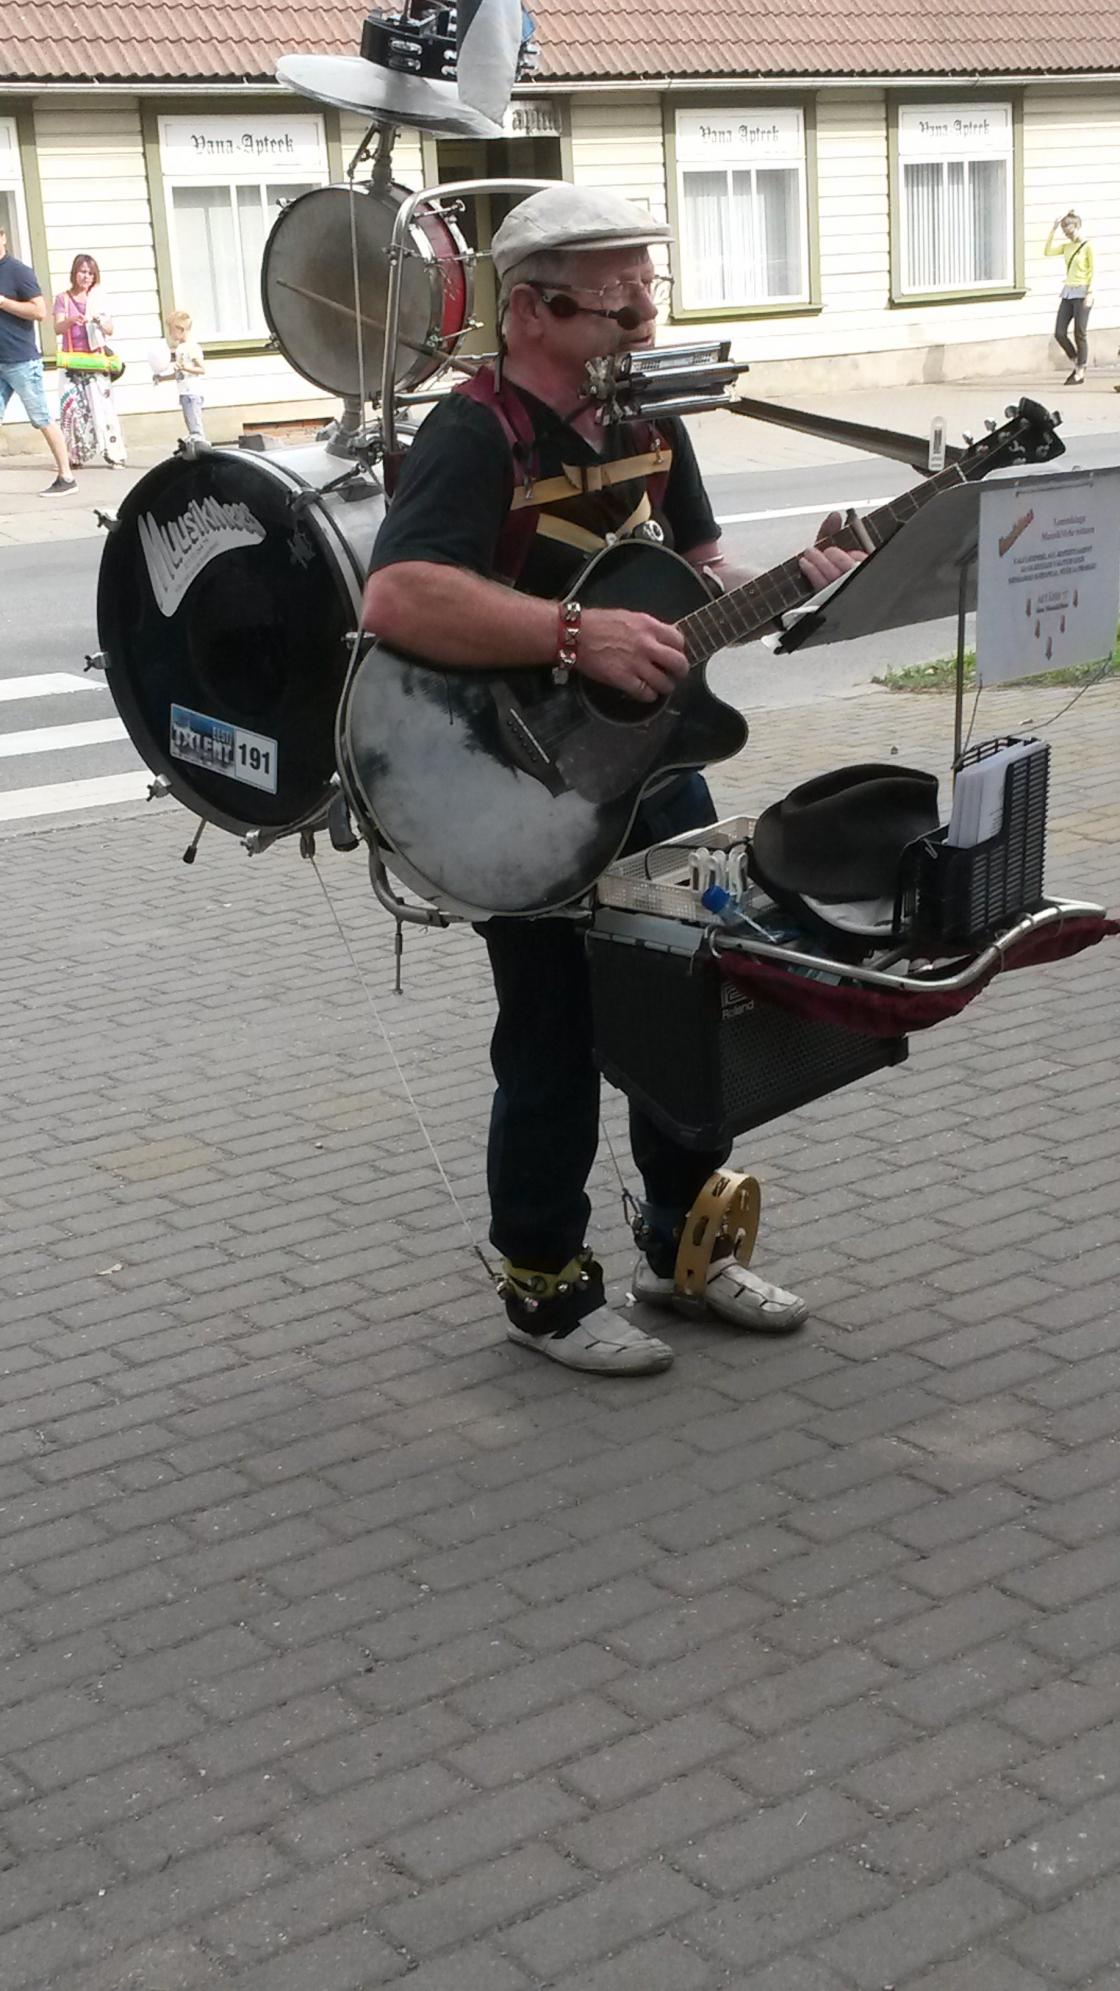 Mees nagu orkester